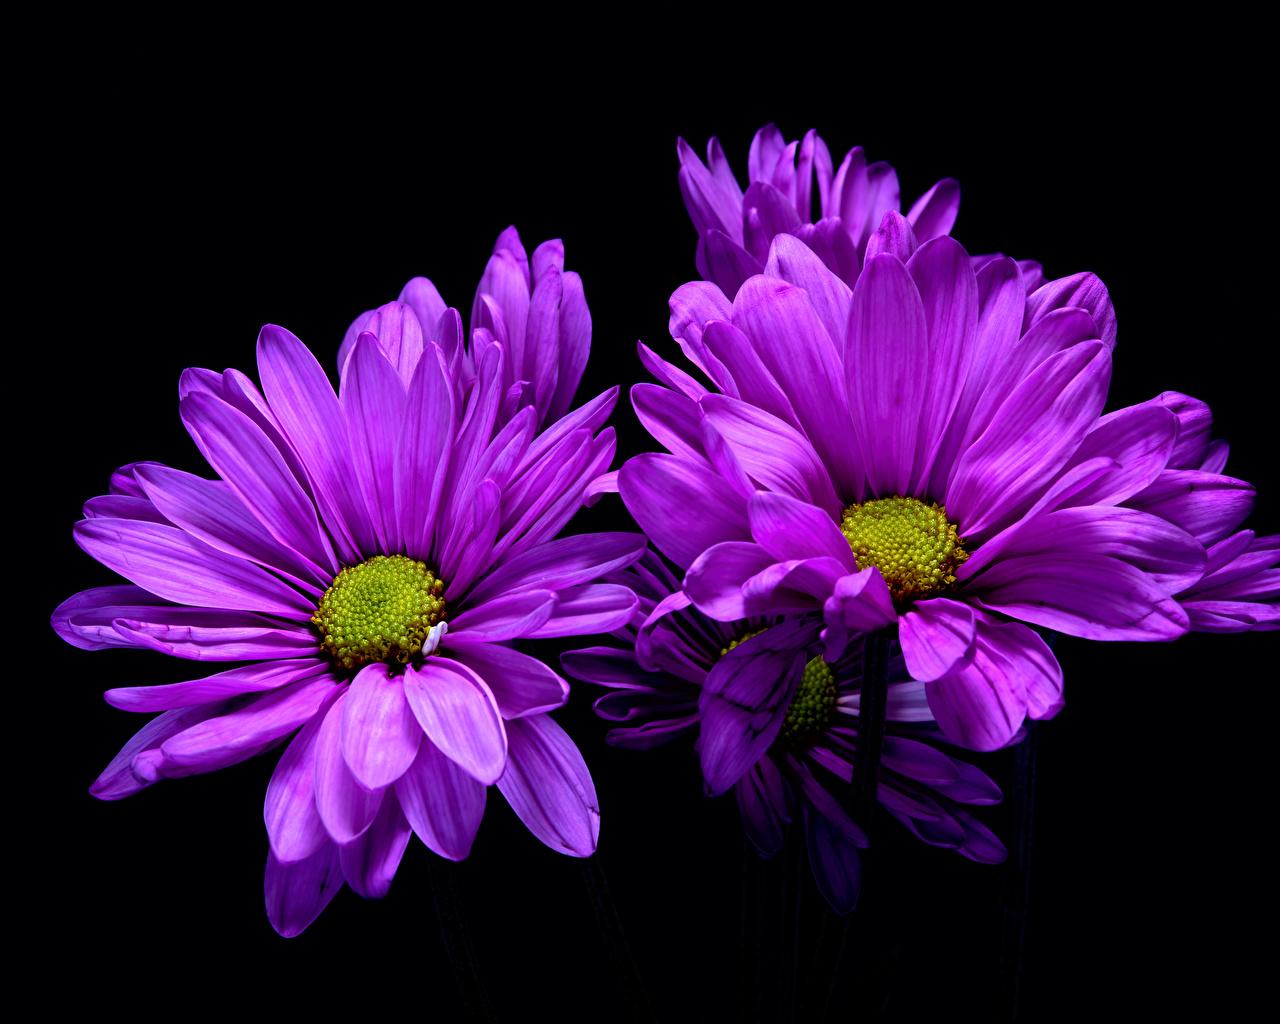 Photo Violet Flowers Chrysanthemums Closeup Black background Mums flower Chrysanths